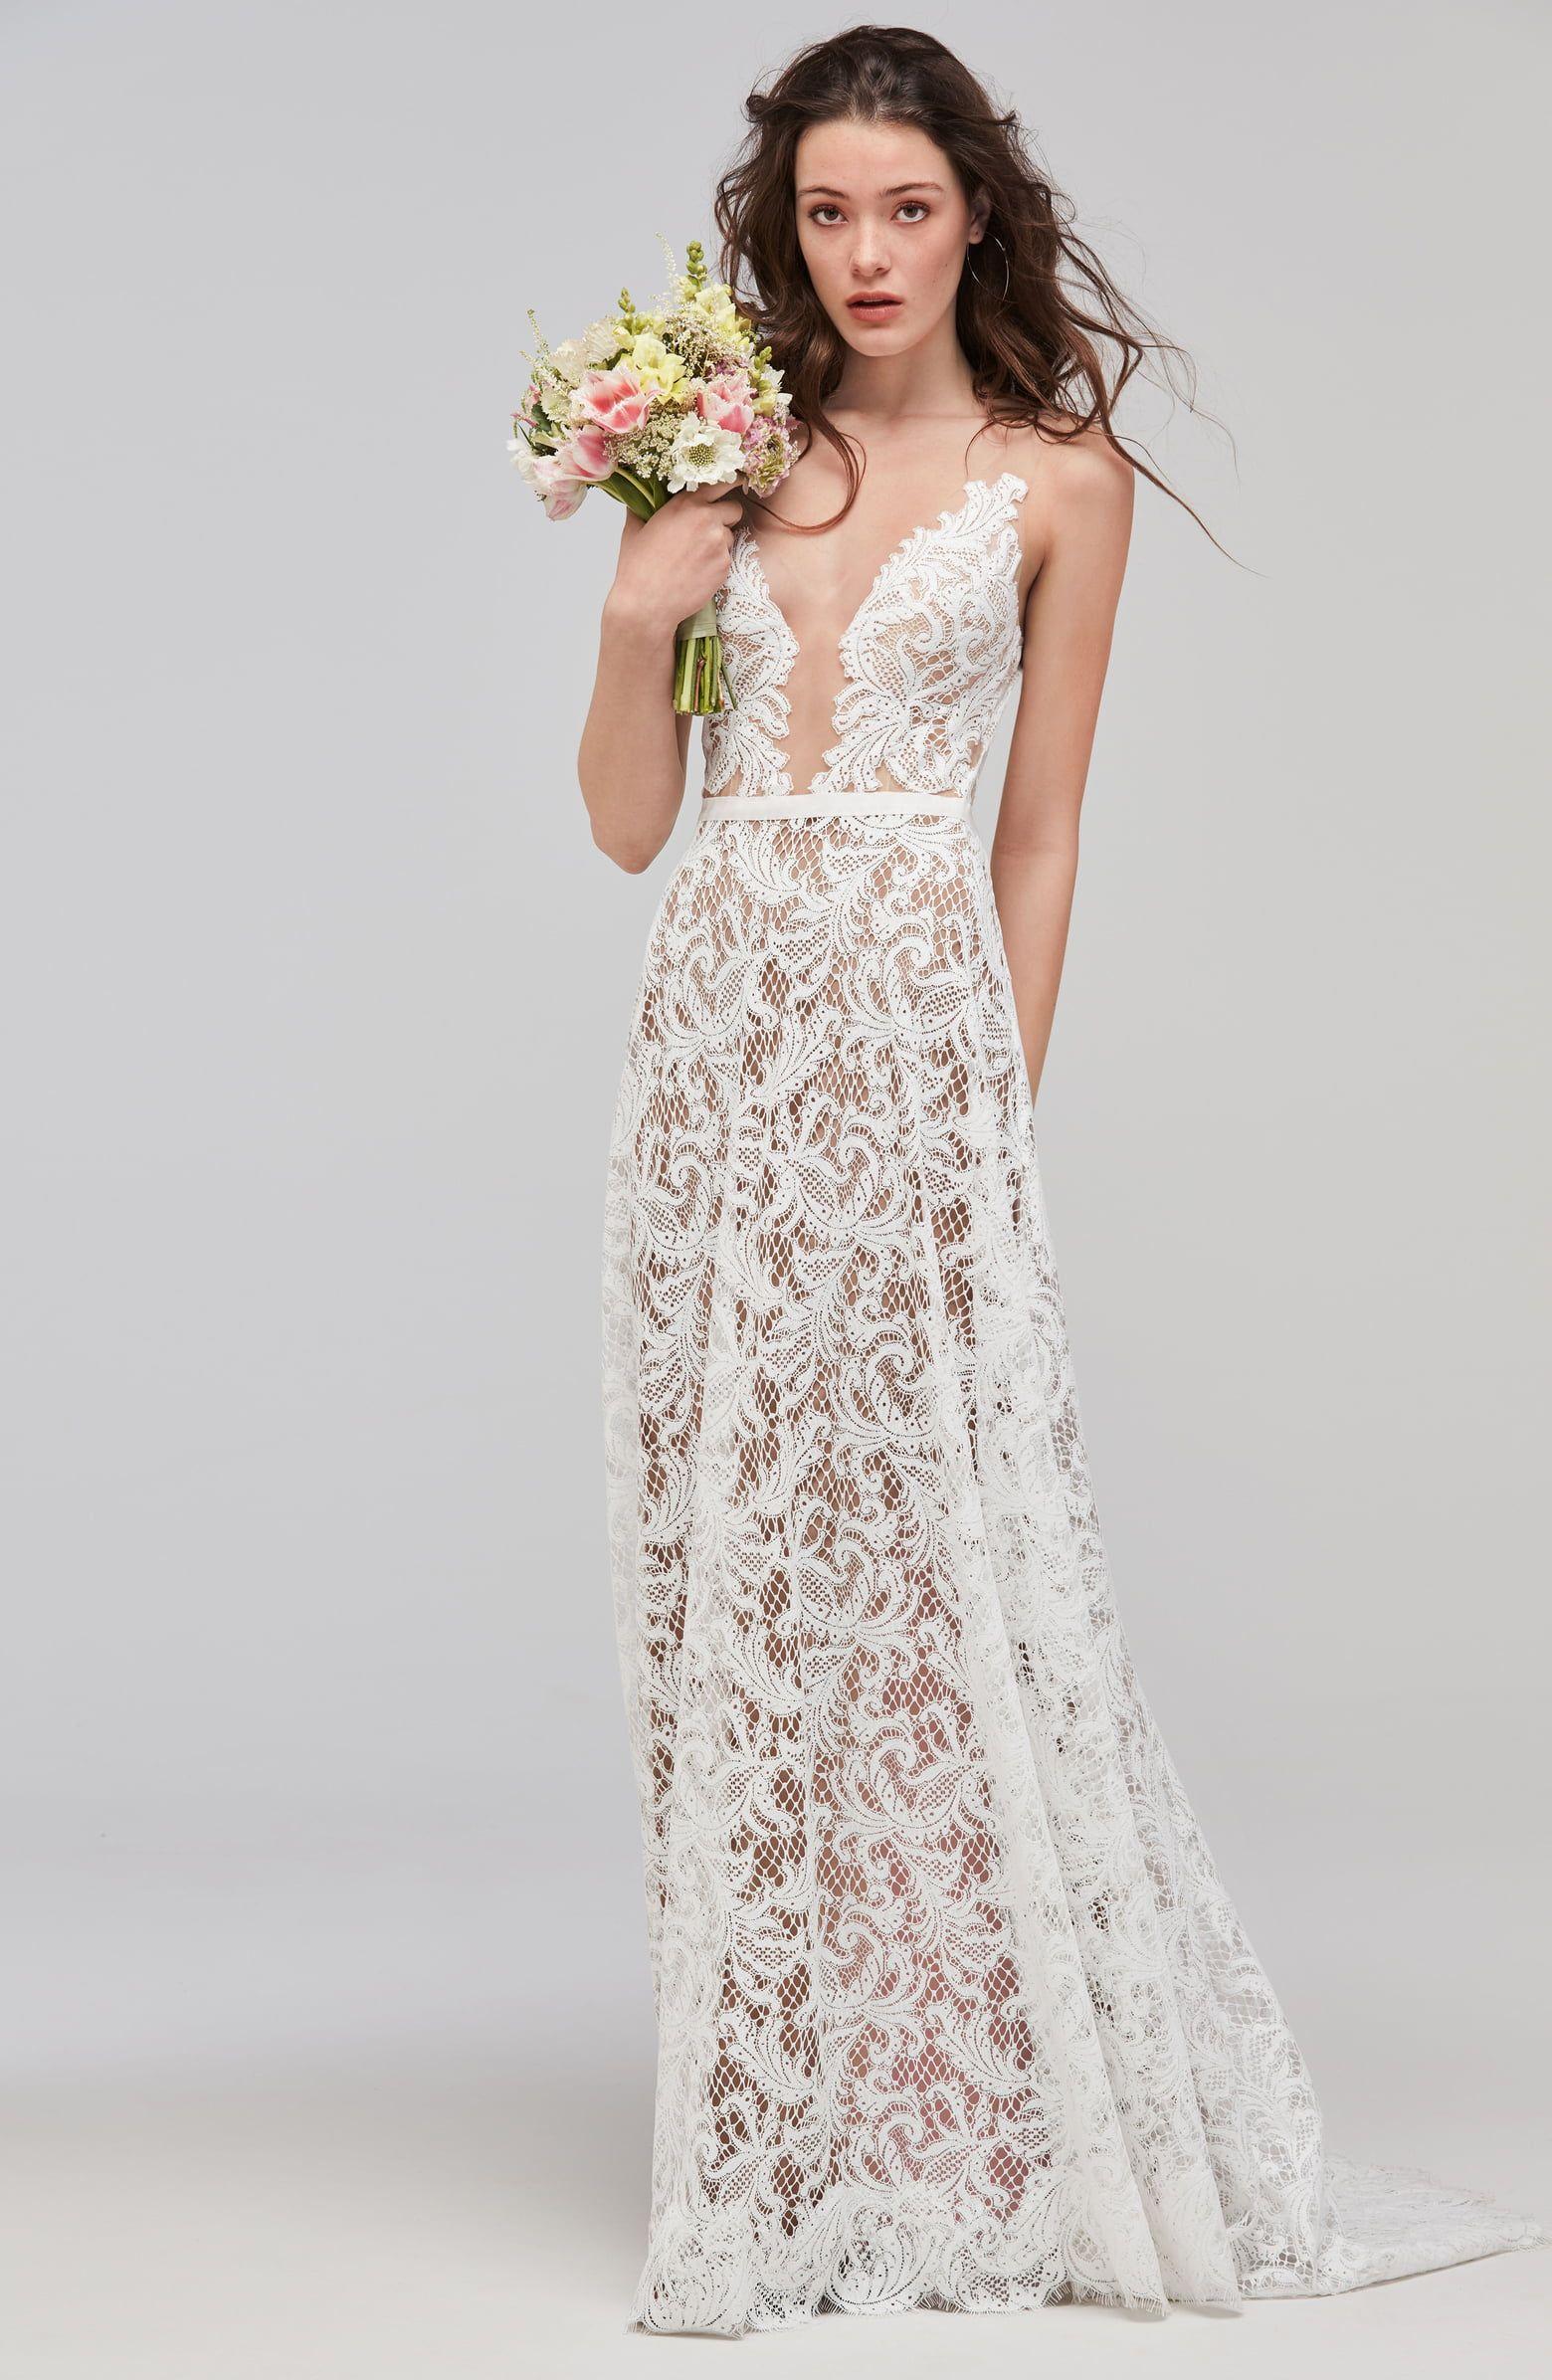 Nordstrom Wedding Dresses.Wedding Dresses Nordstrom Lixnet Ag